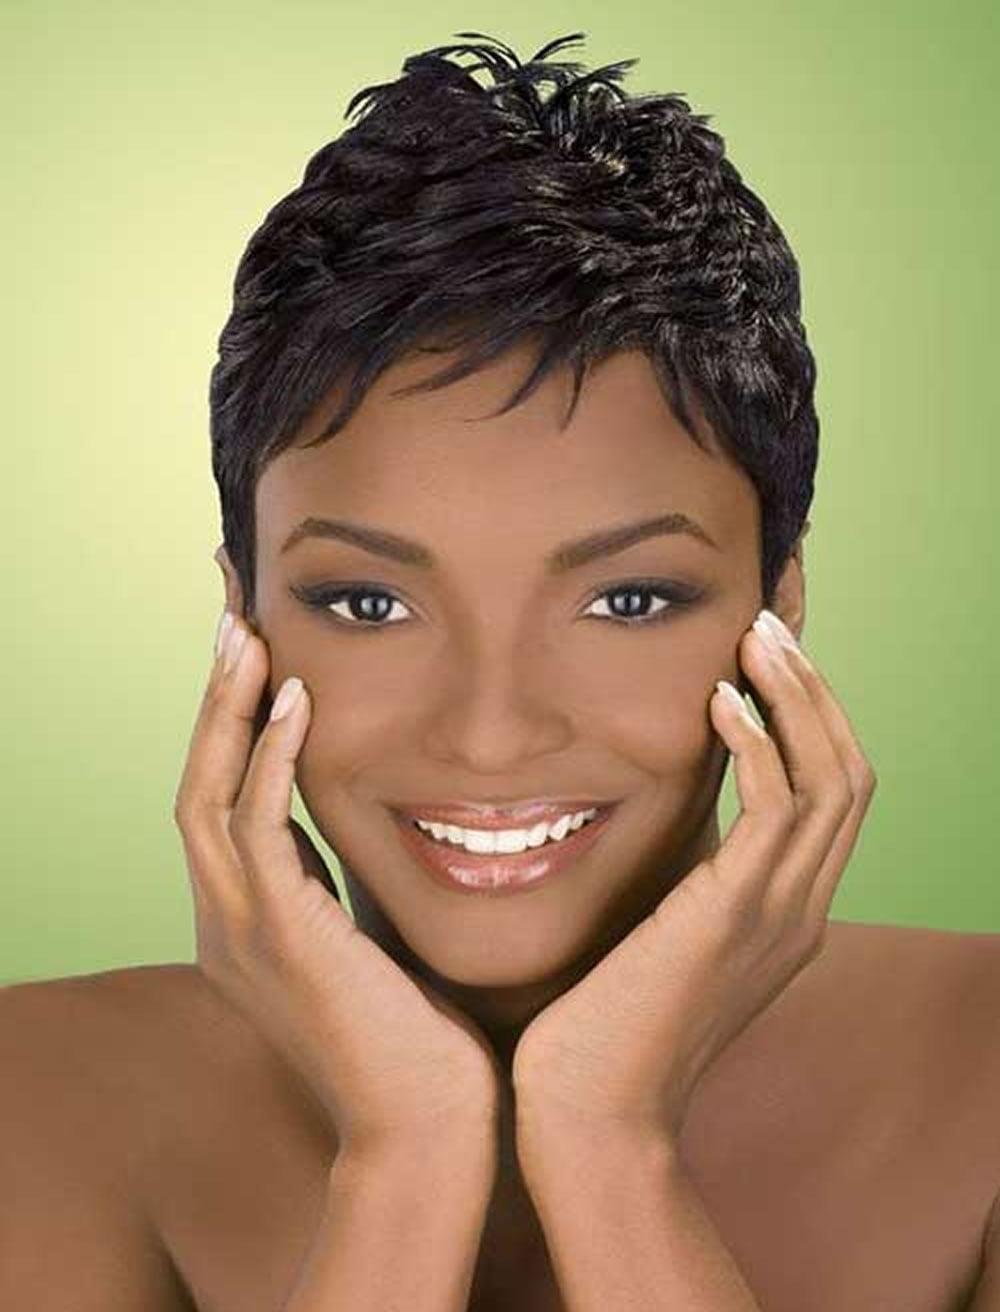 2018 Short Haircuts for Black Women - 67 Pixie Short Black Hair ideas - Page 10 - HAIRSTYLES